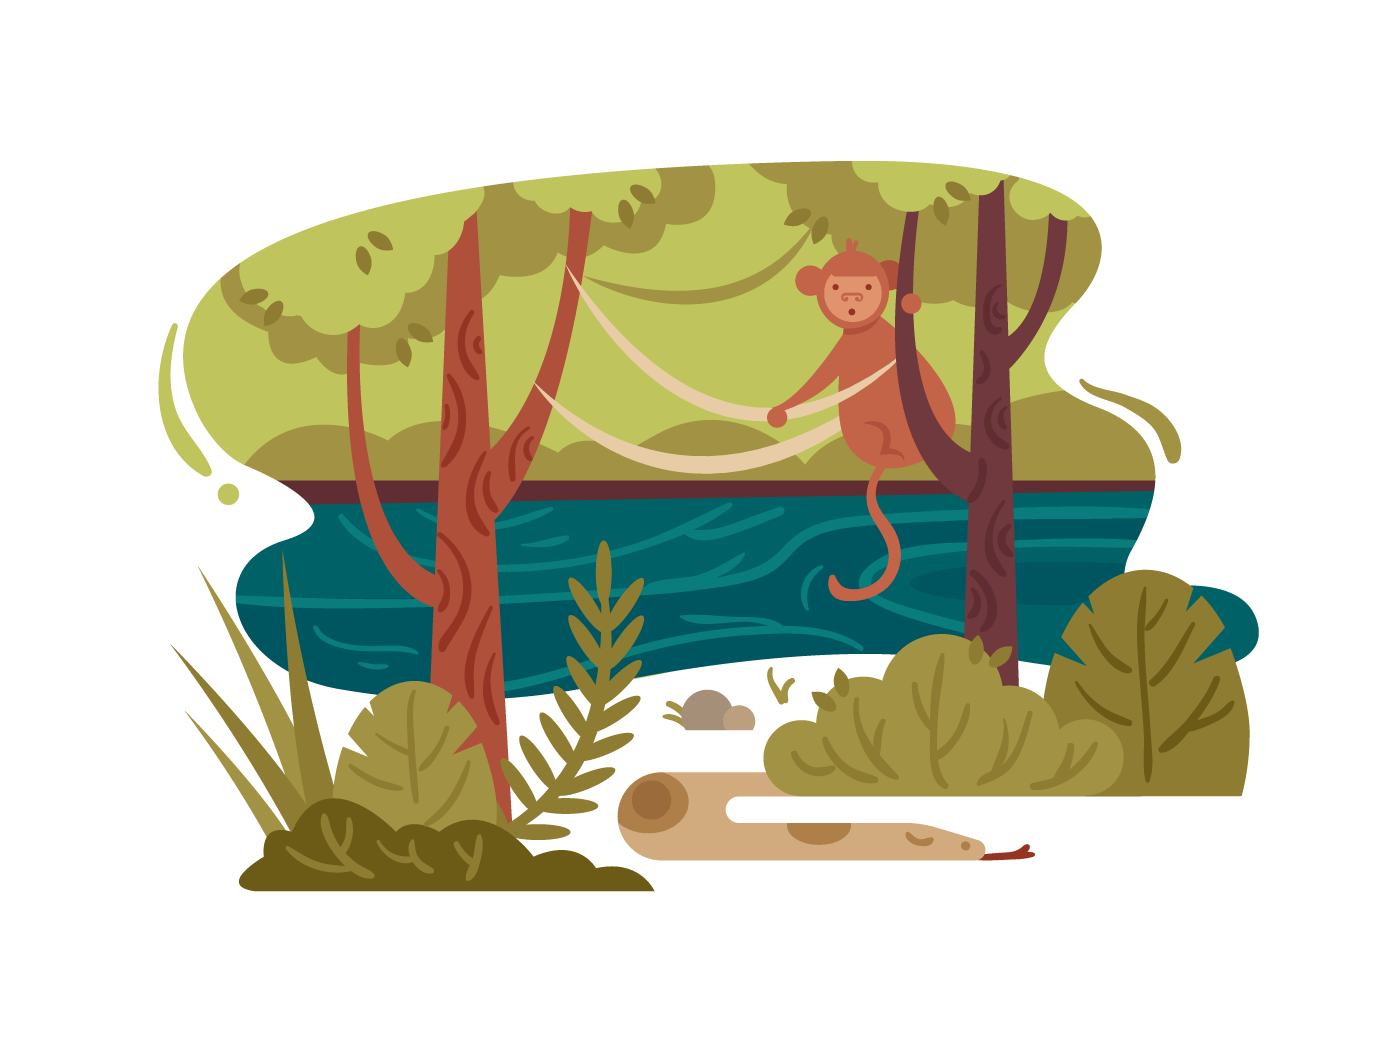 Wild jungle forest illustration